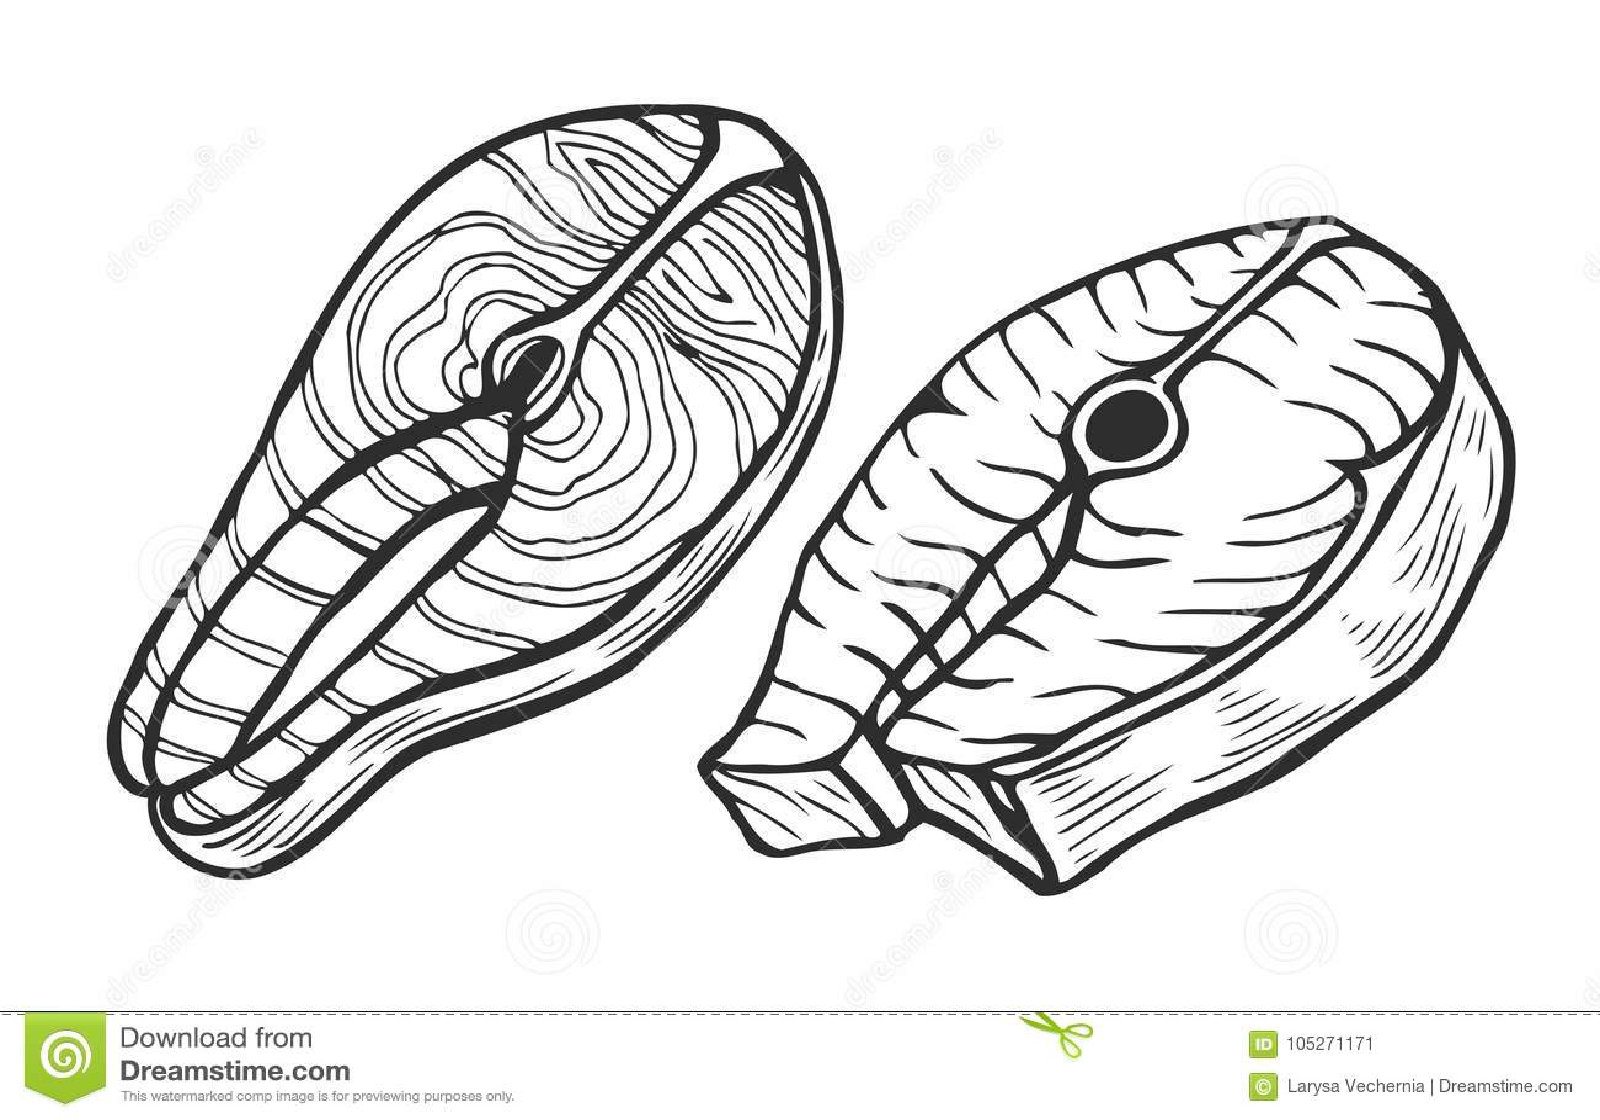 Atlantic Salmon Cuts Diagram Vector Illustration